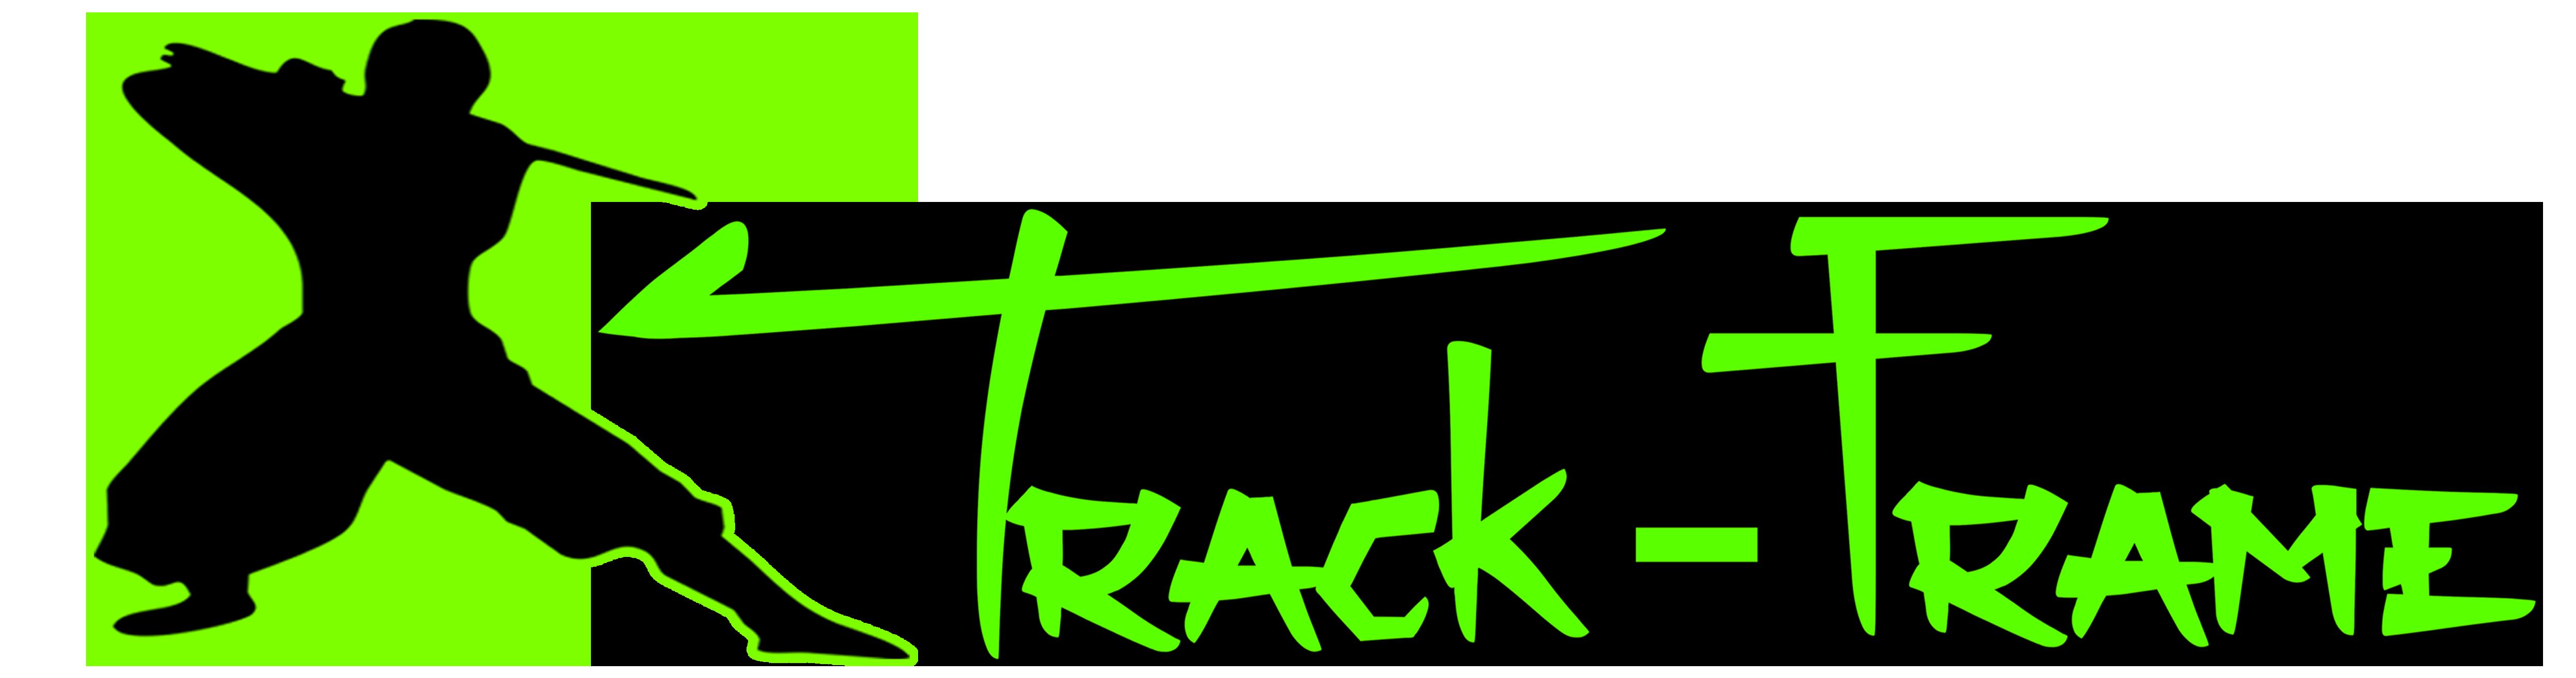 Track-Frame